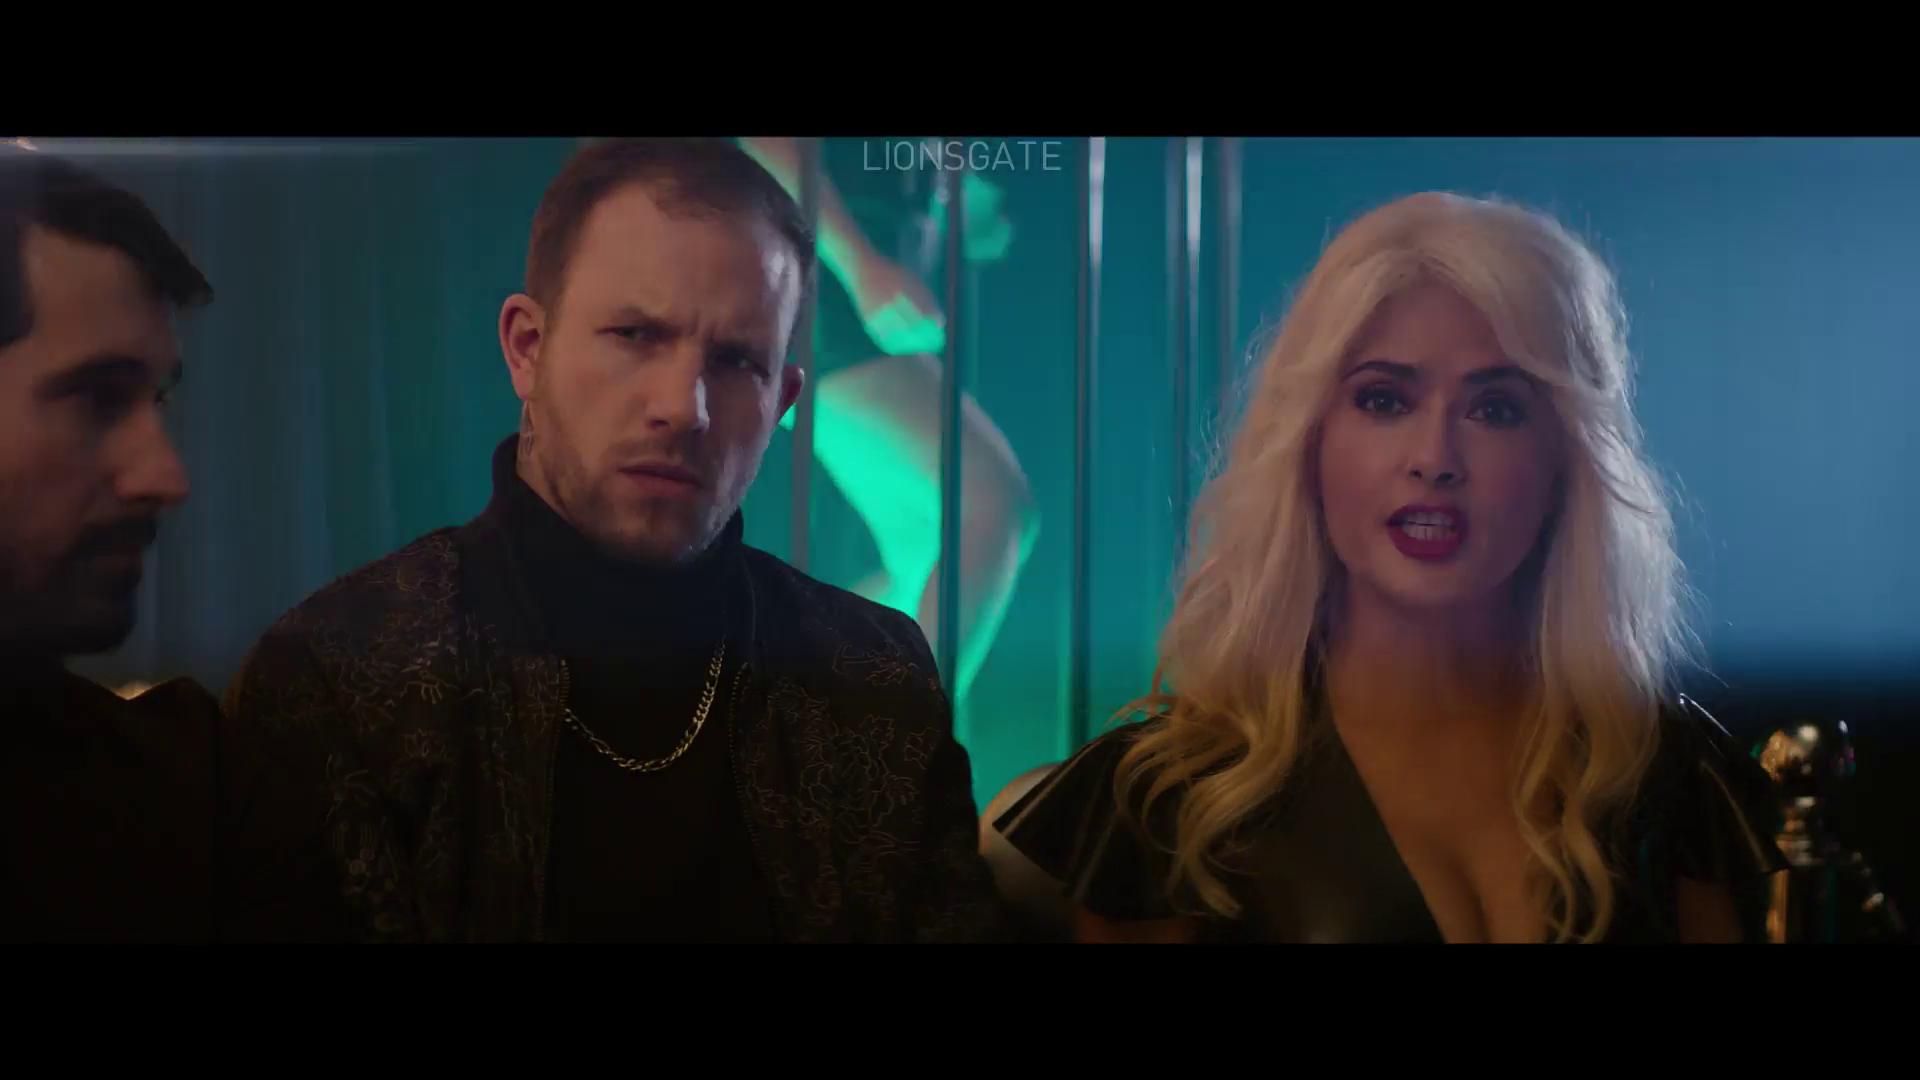 Download The Hitman's Wife's Bodyguard Movie English audio scene 3